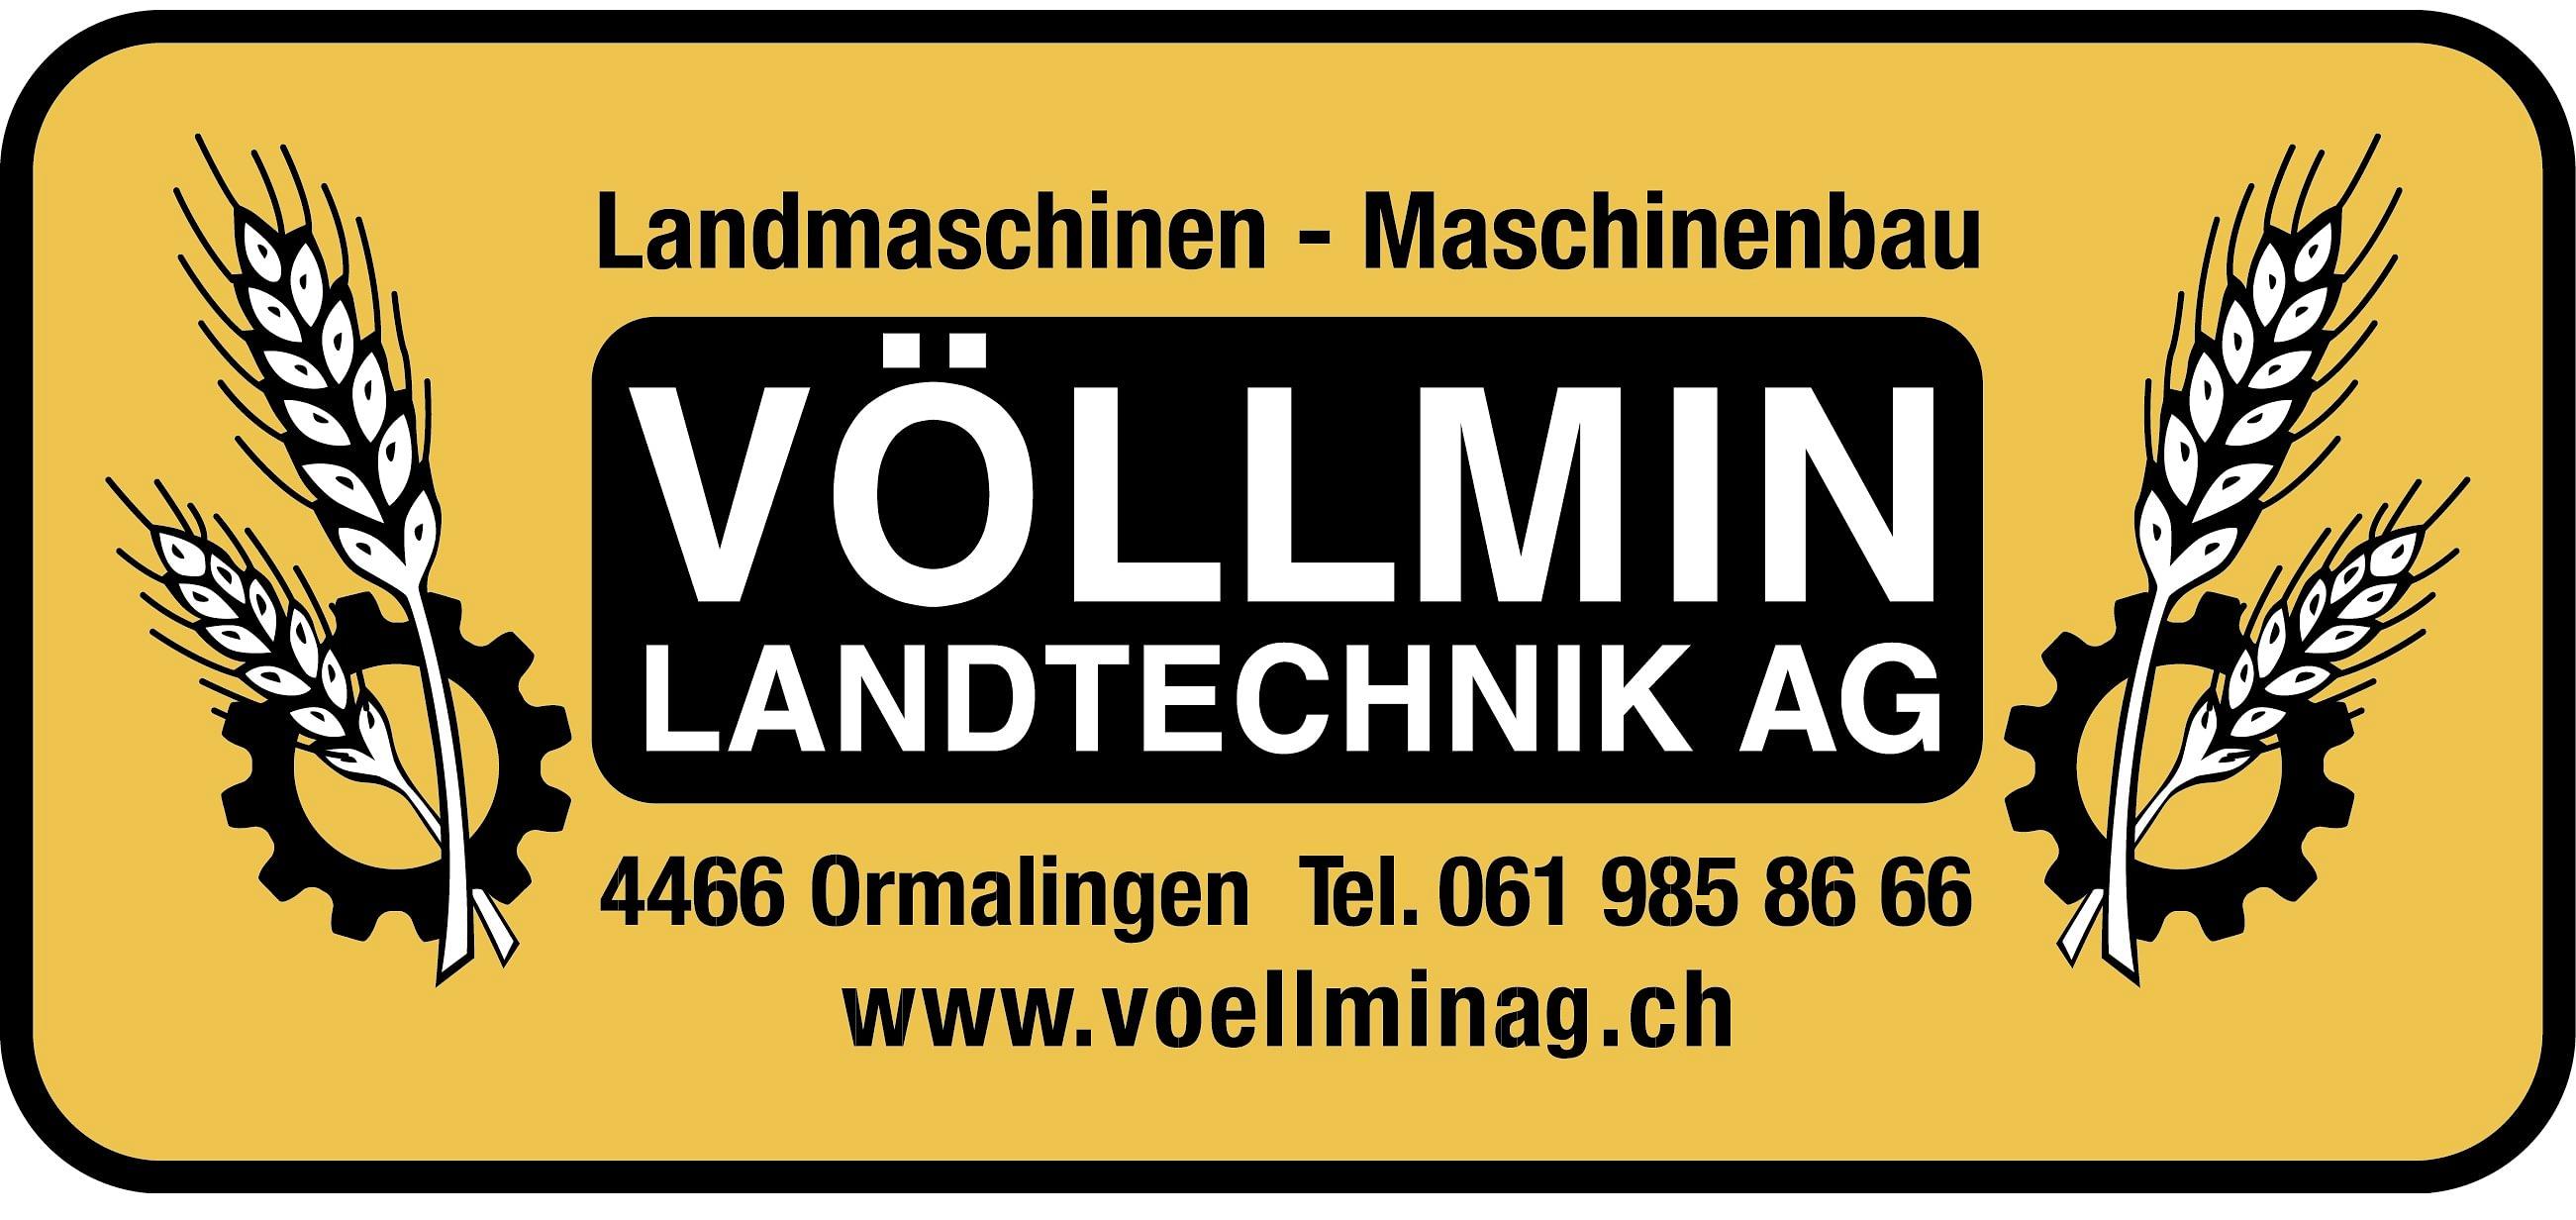 Völlmin Landtechnik AG